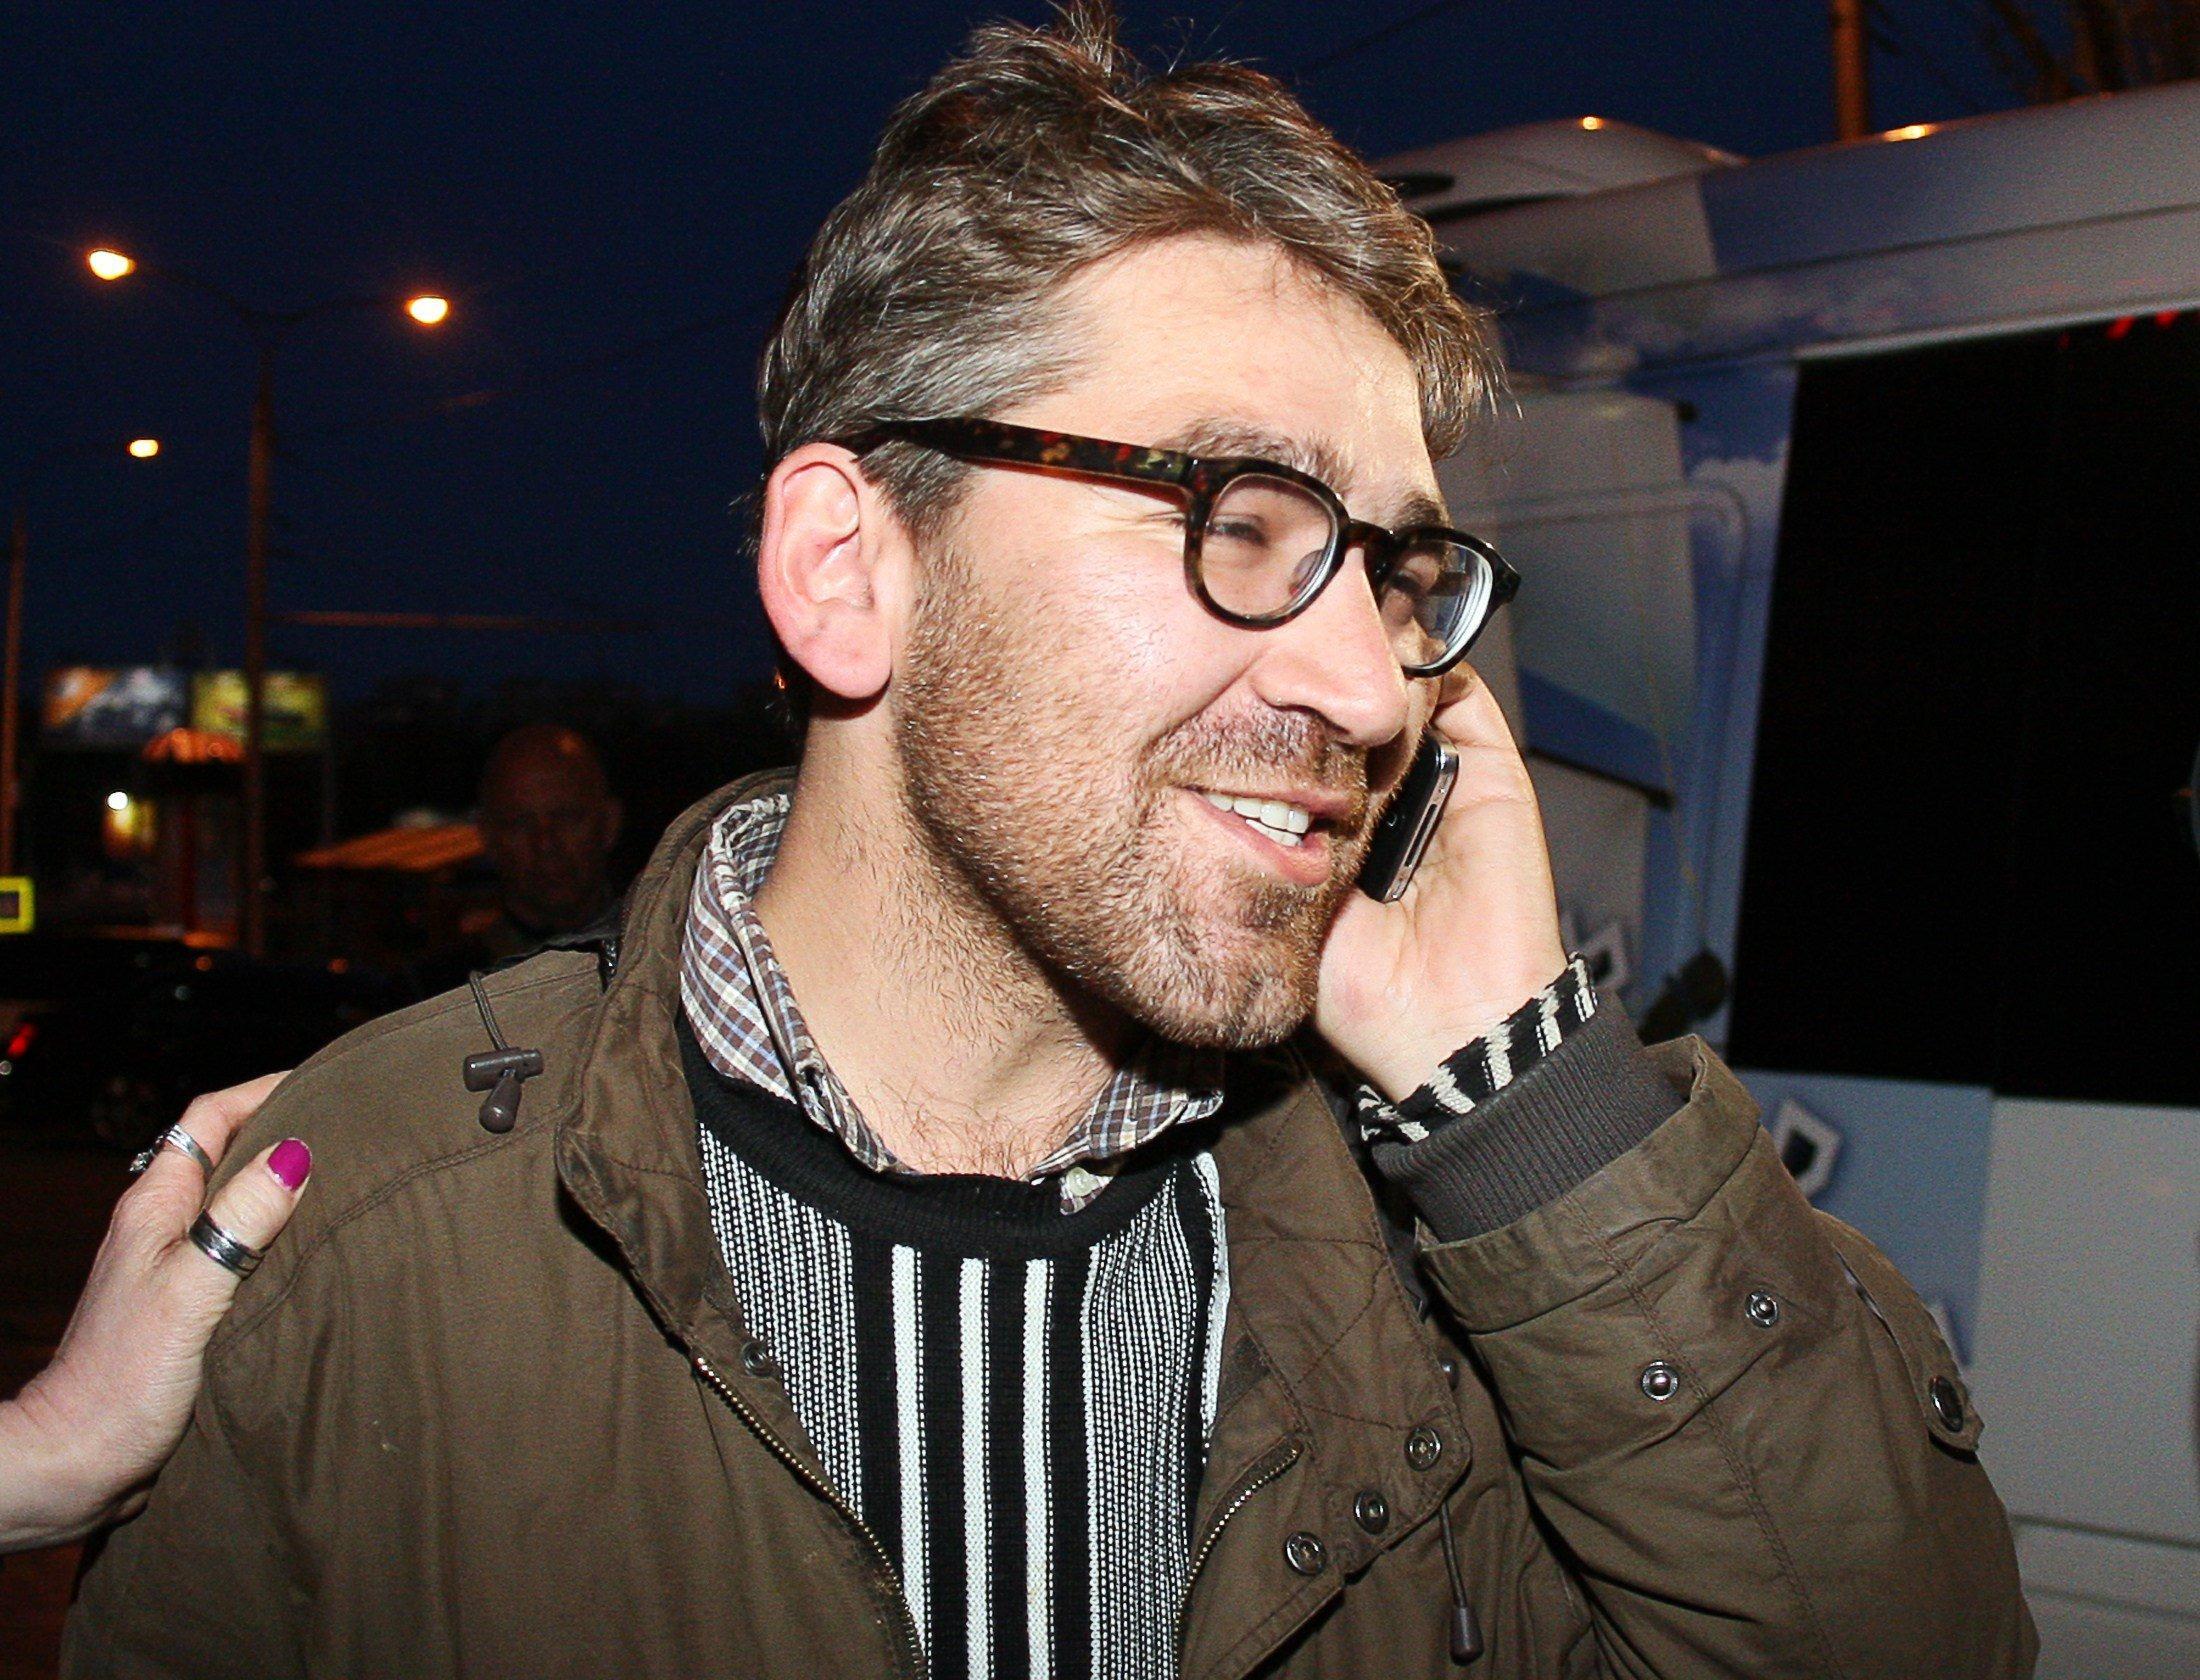 Image: UKRAINE-US-RUSSIA-CRISIS-POLITICS-MEDIA-FREE